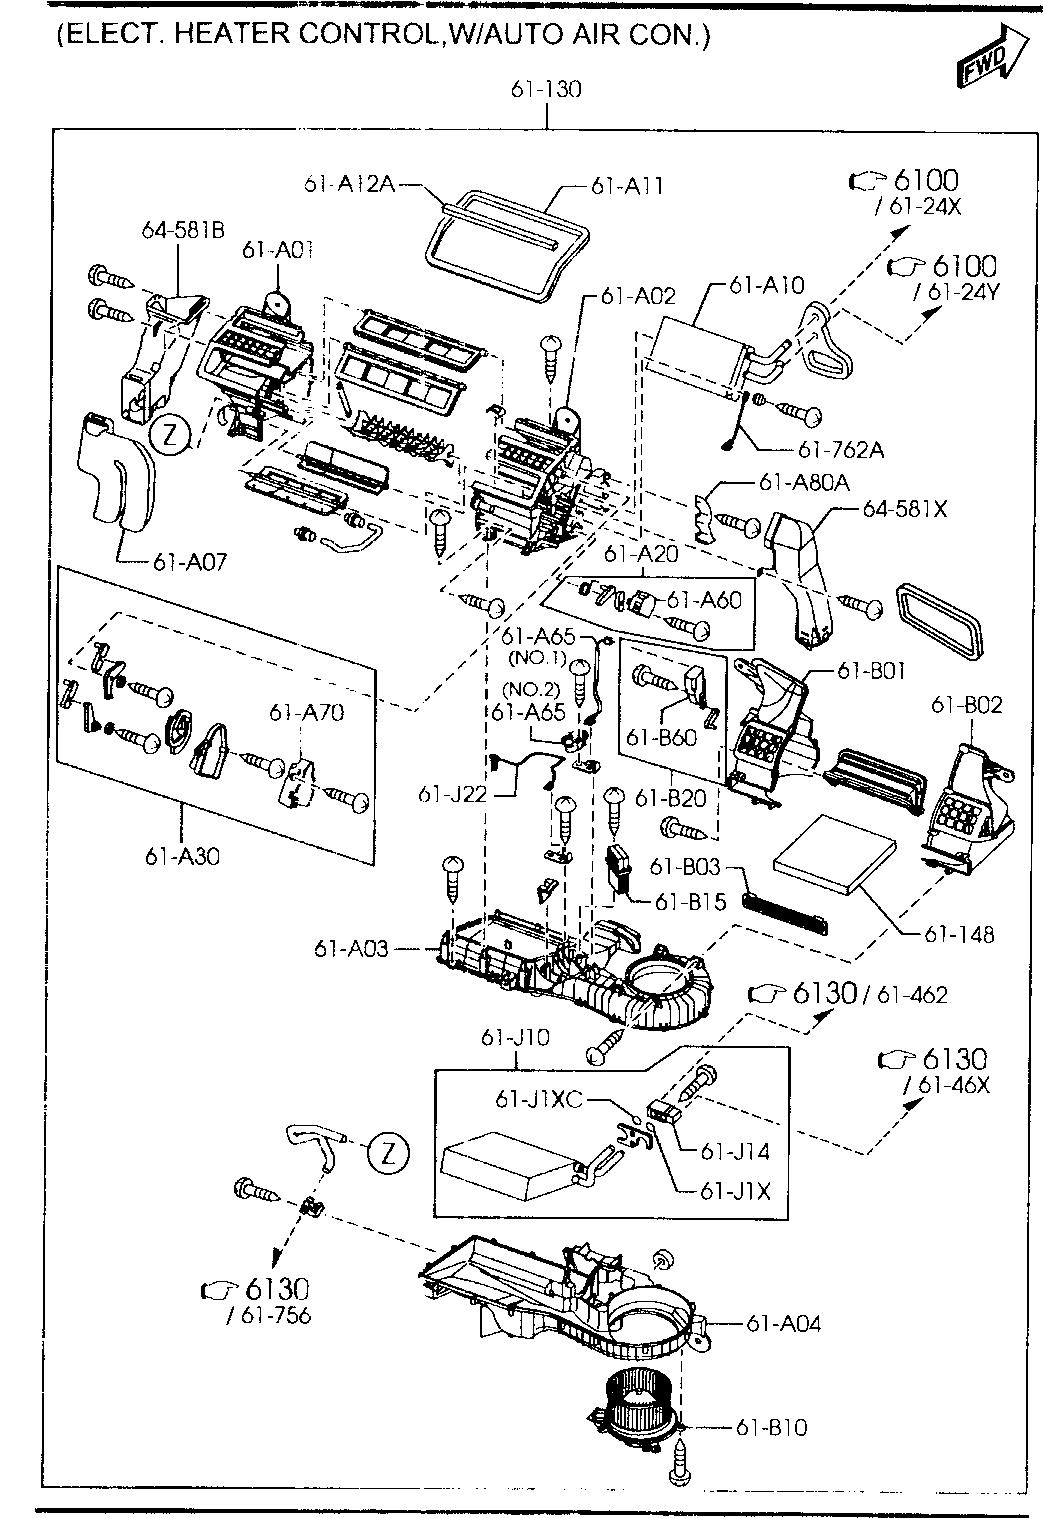 Thermal Evaporator Replacement Parts Mazda GK3J-61-J22 A/C